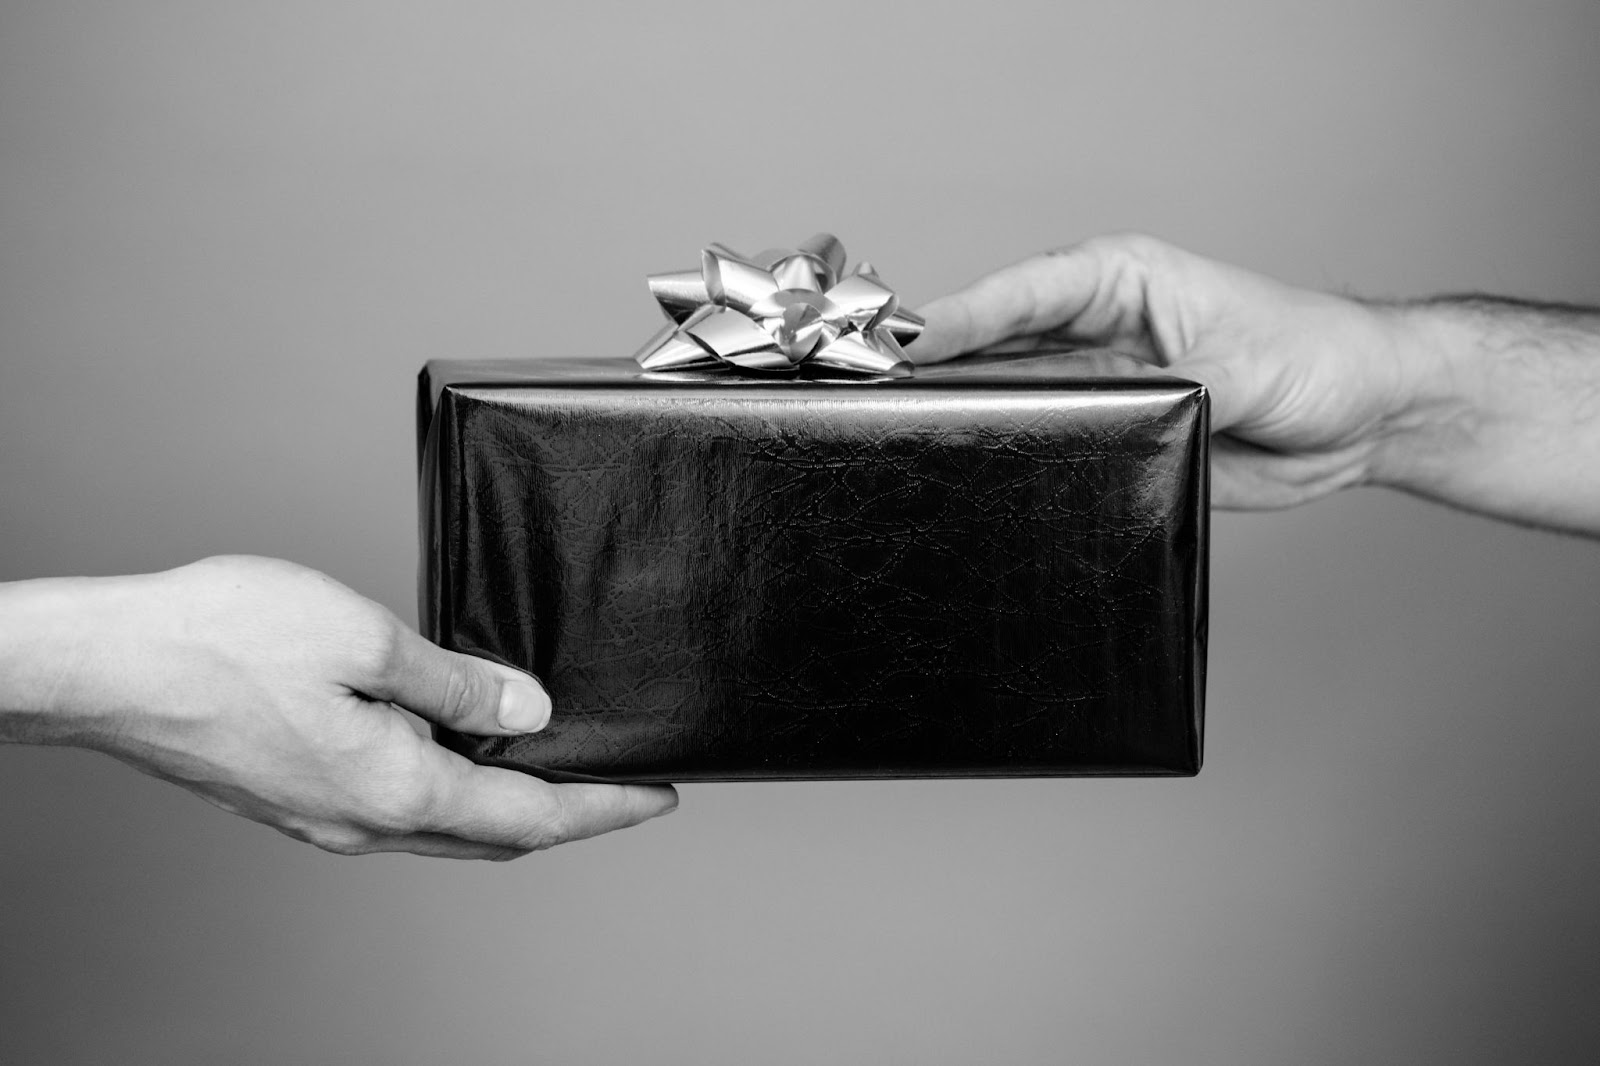 Giving an employee a gift